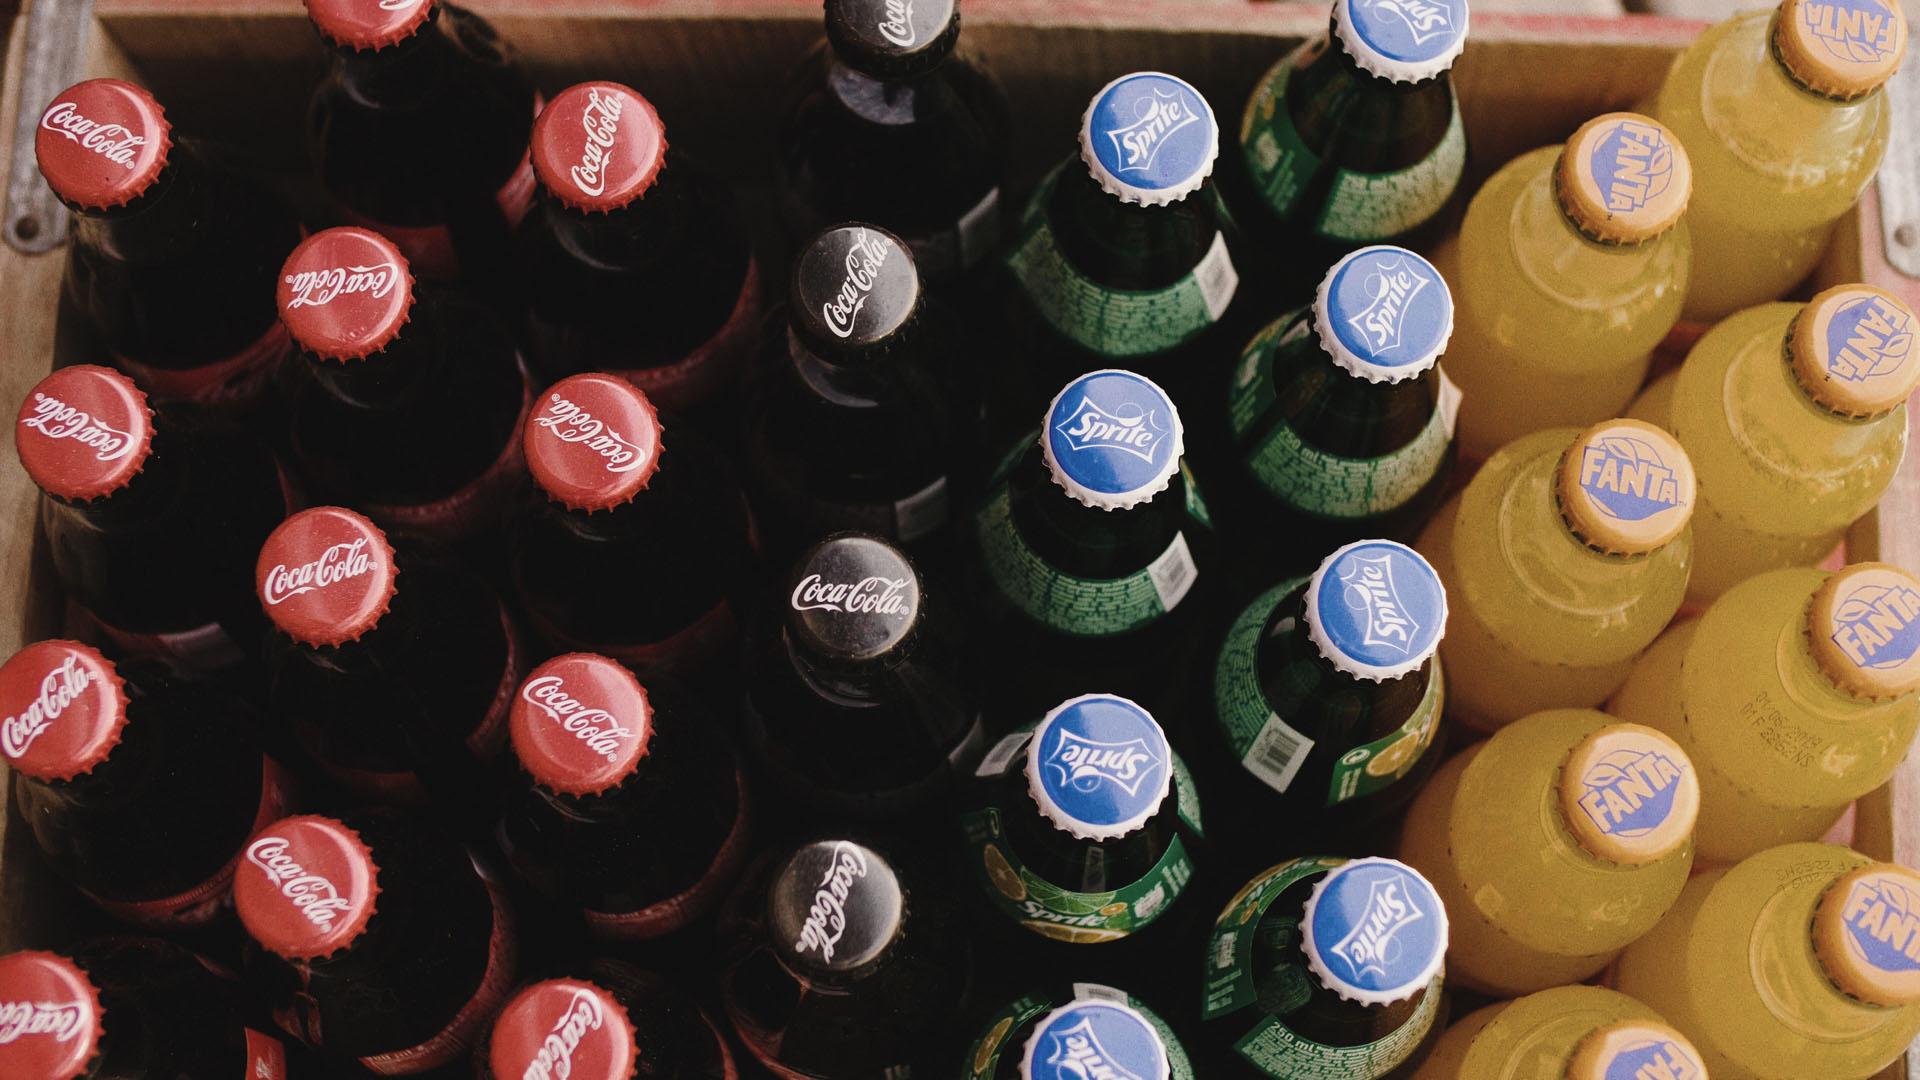 29 ślub cola w butelka sprite fanta